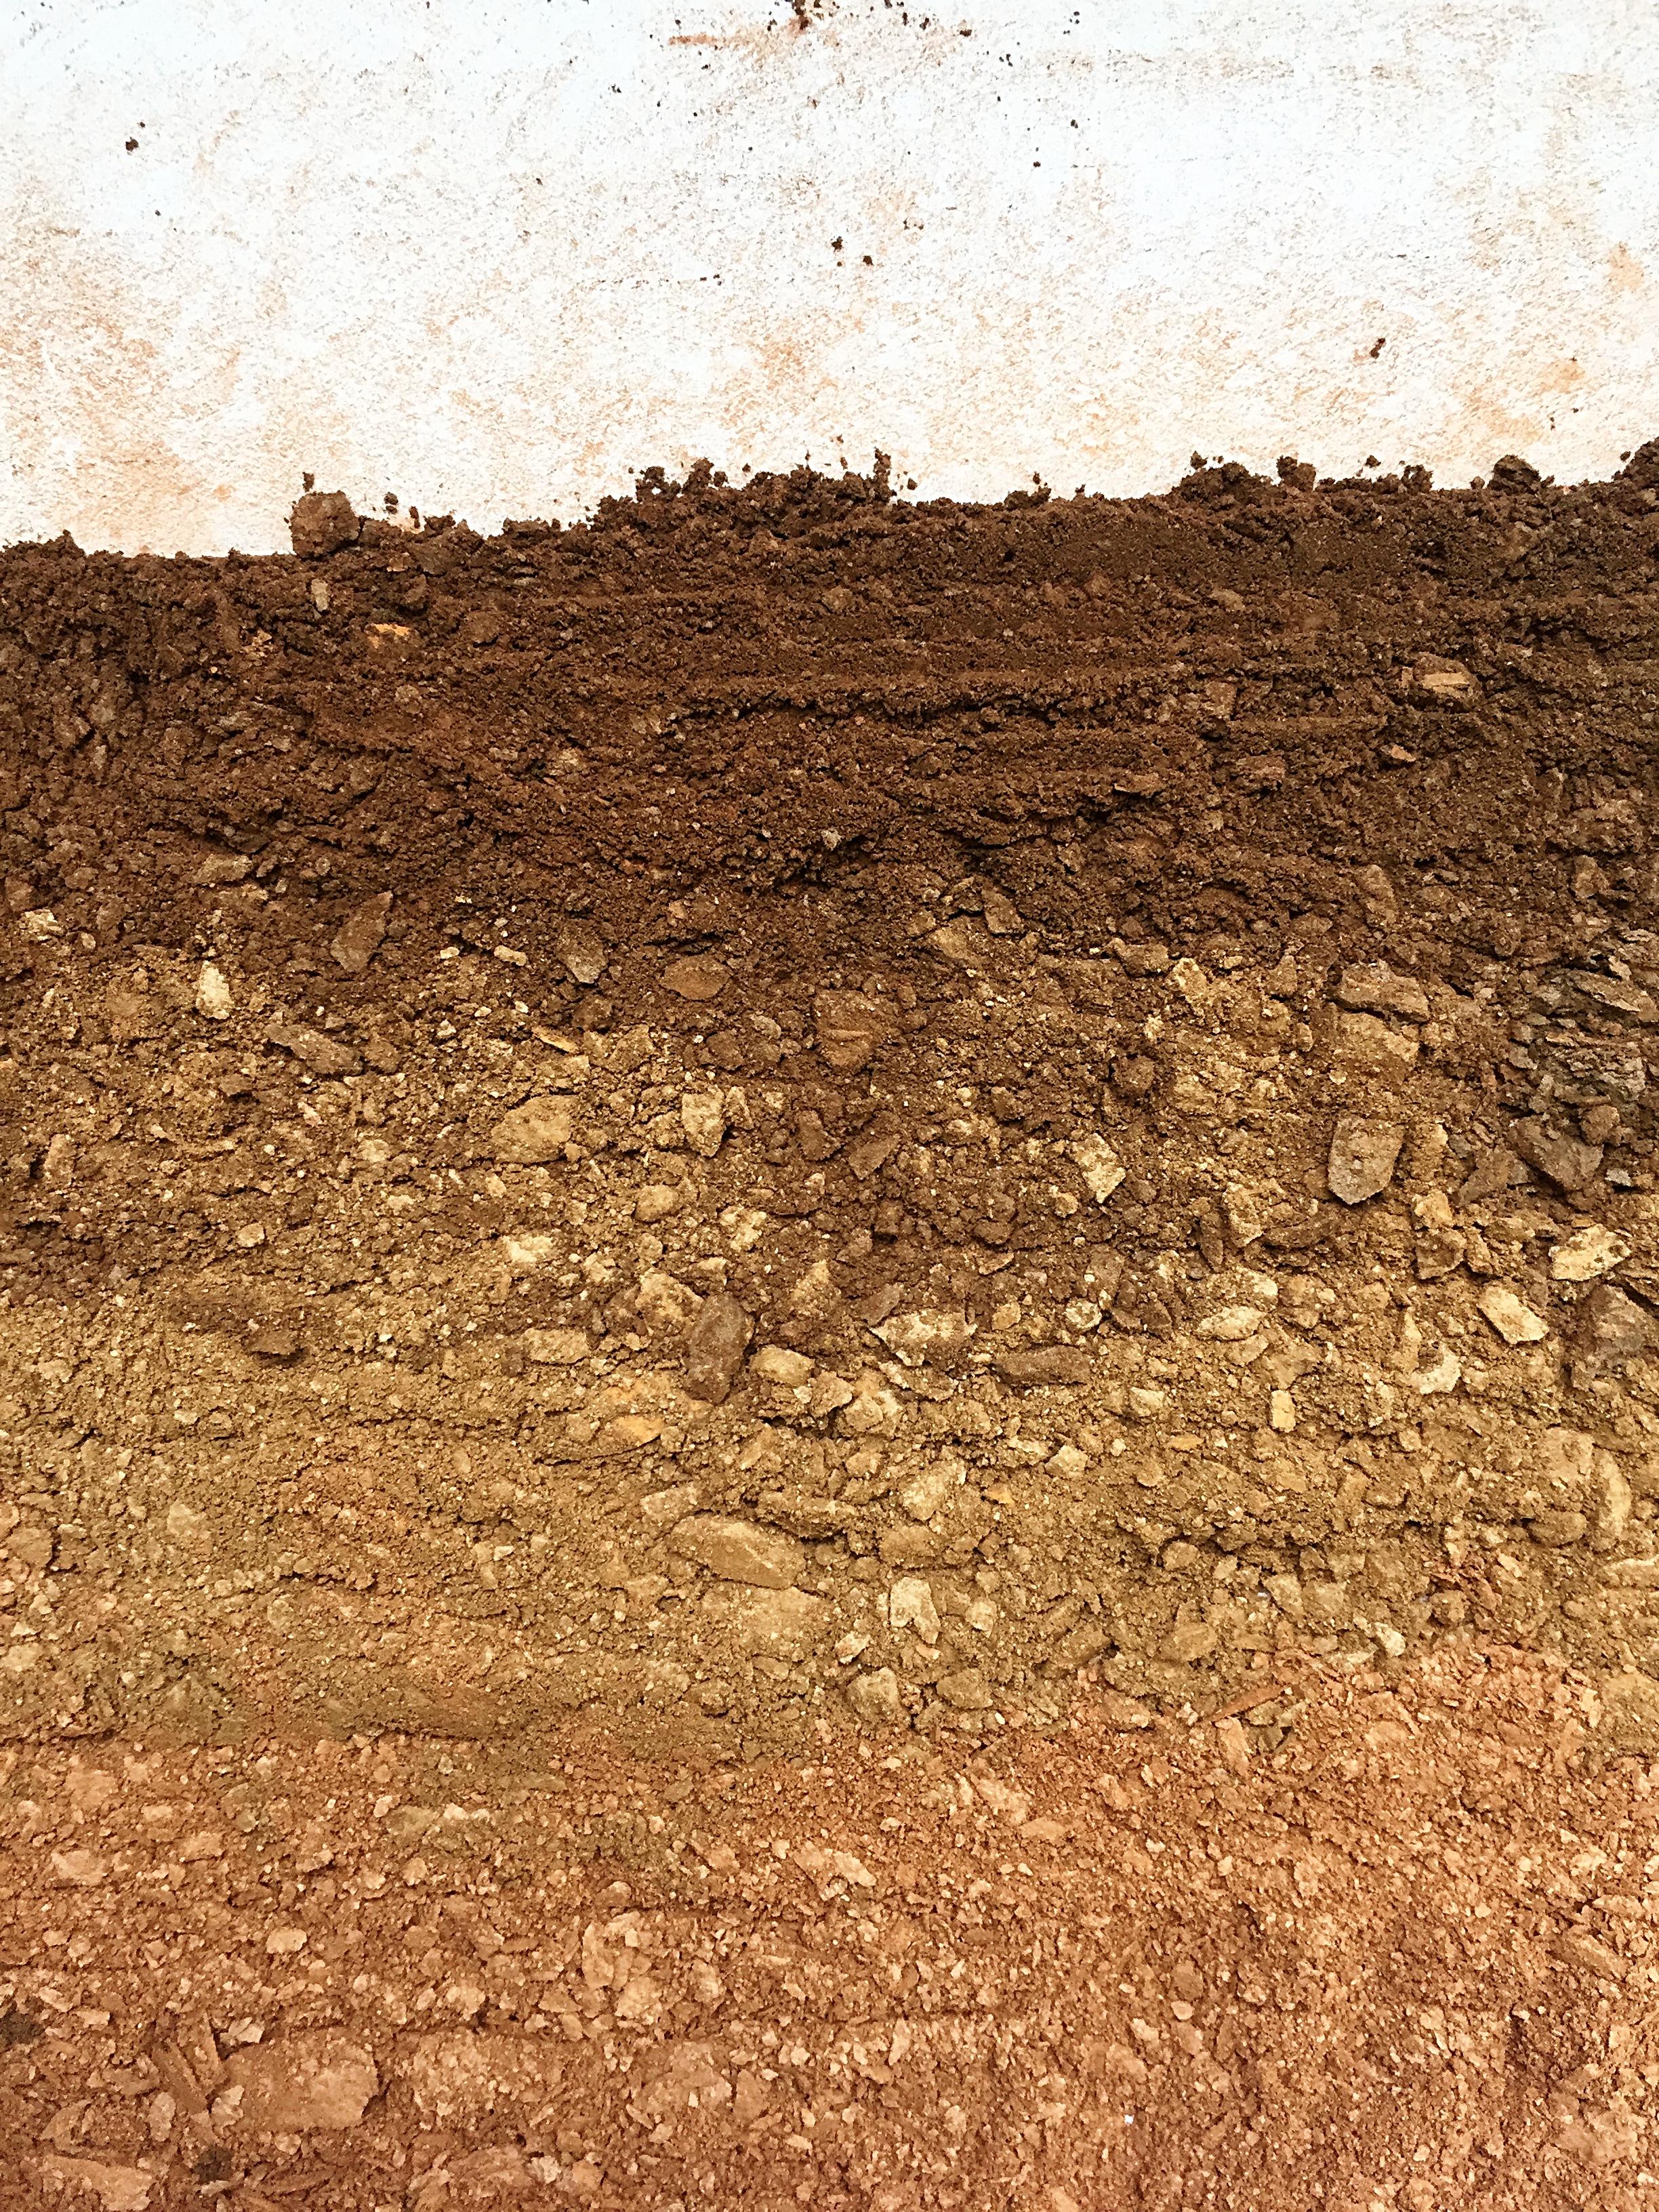 From top: Make Bronzing Brick in Taos, Marfa, and Joshua Tree ($30 each)